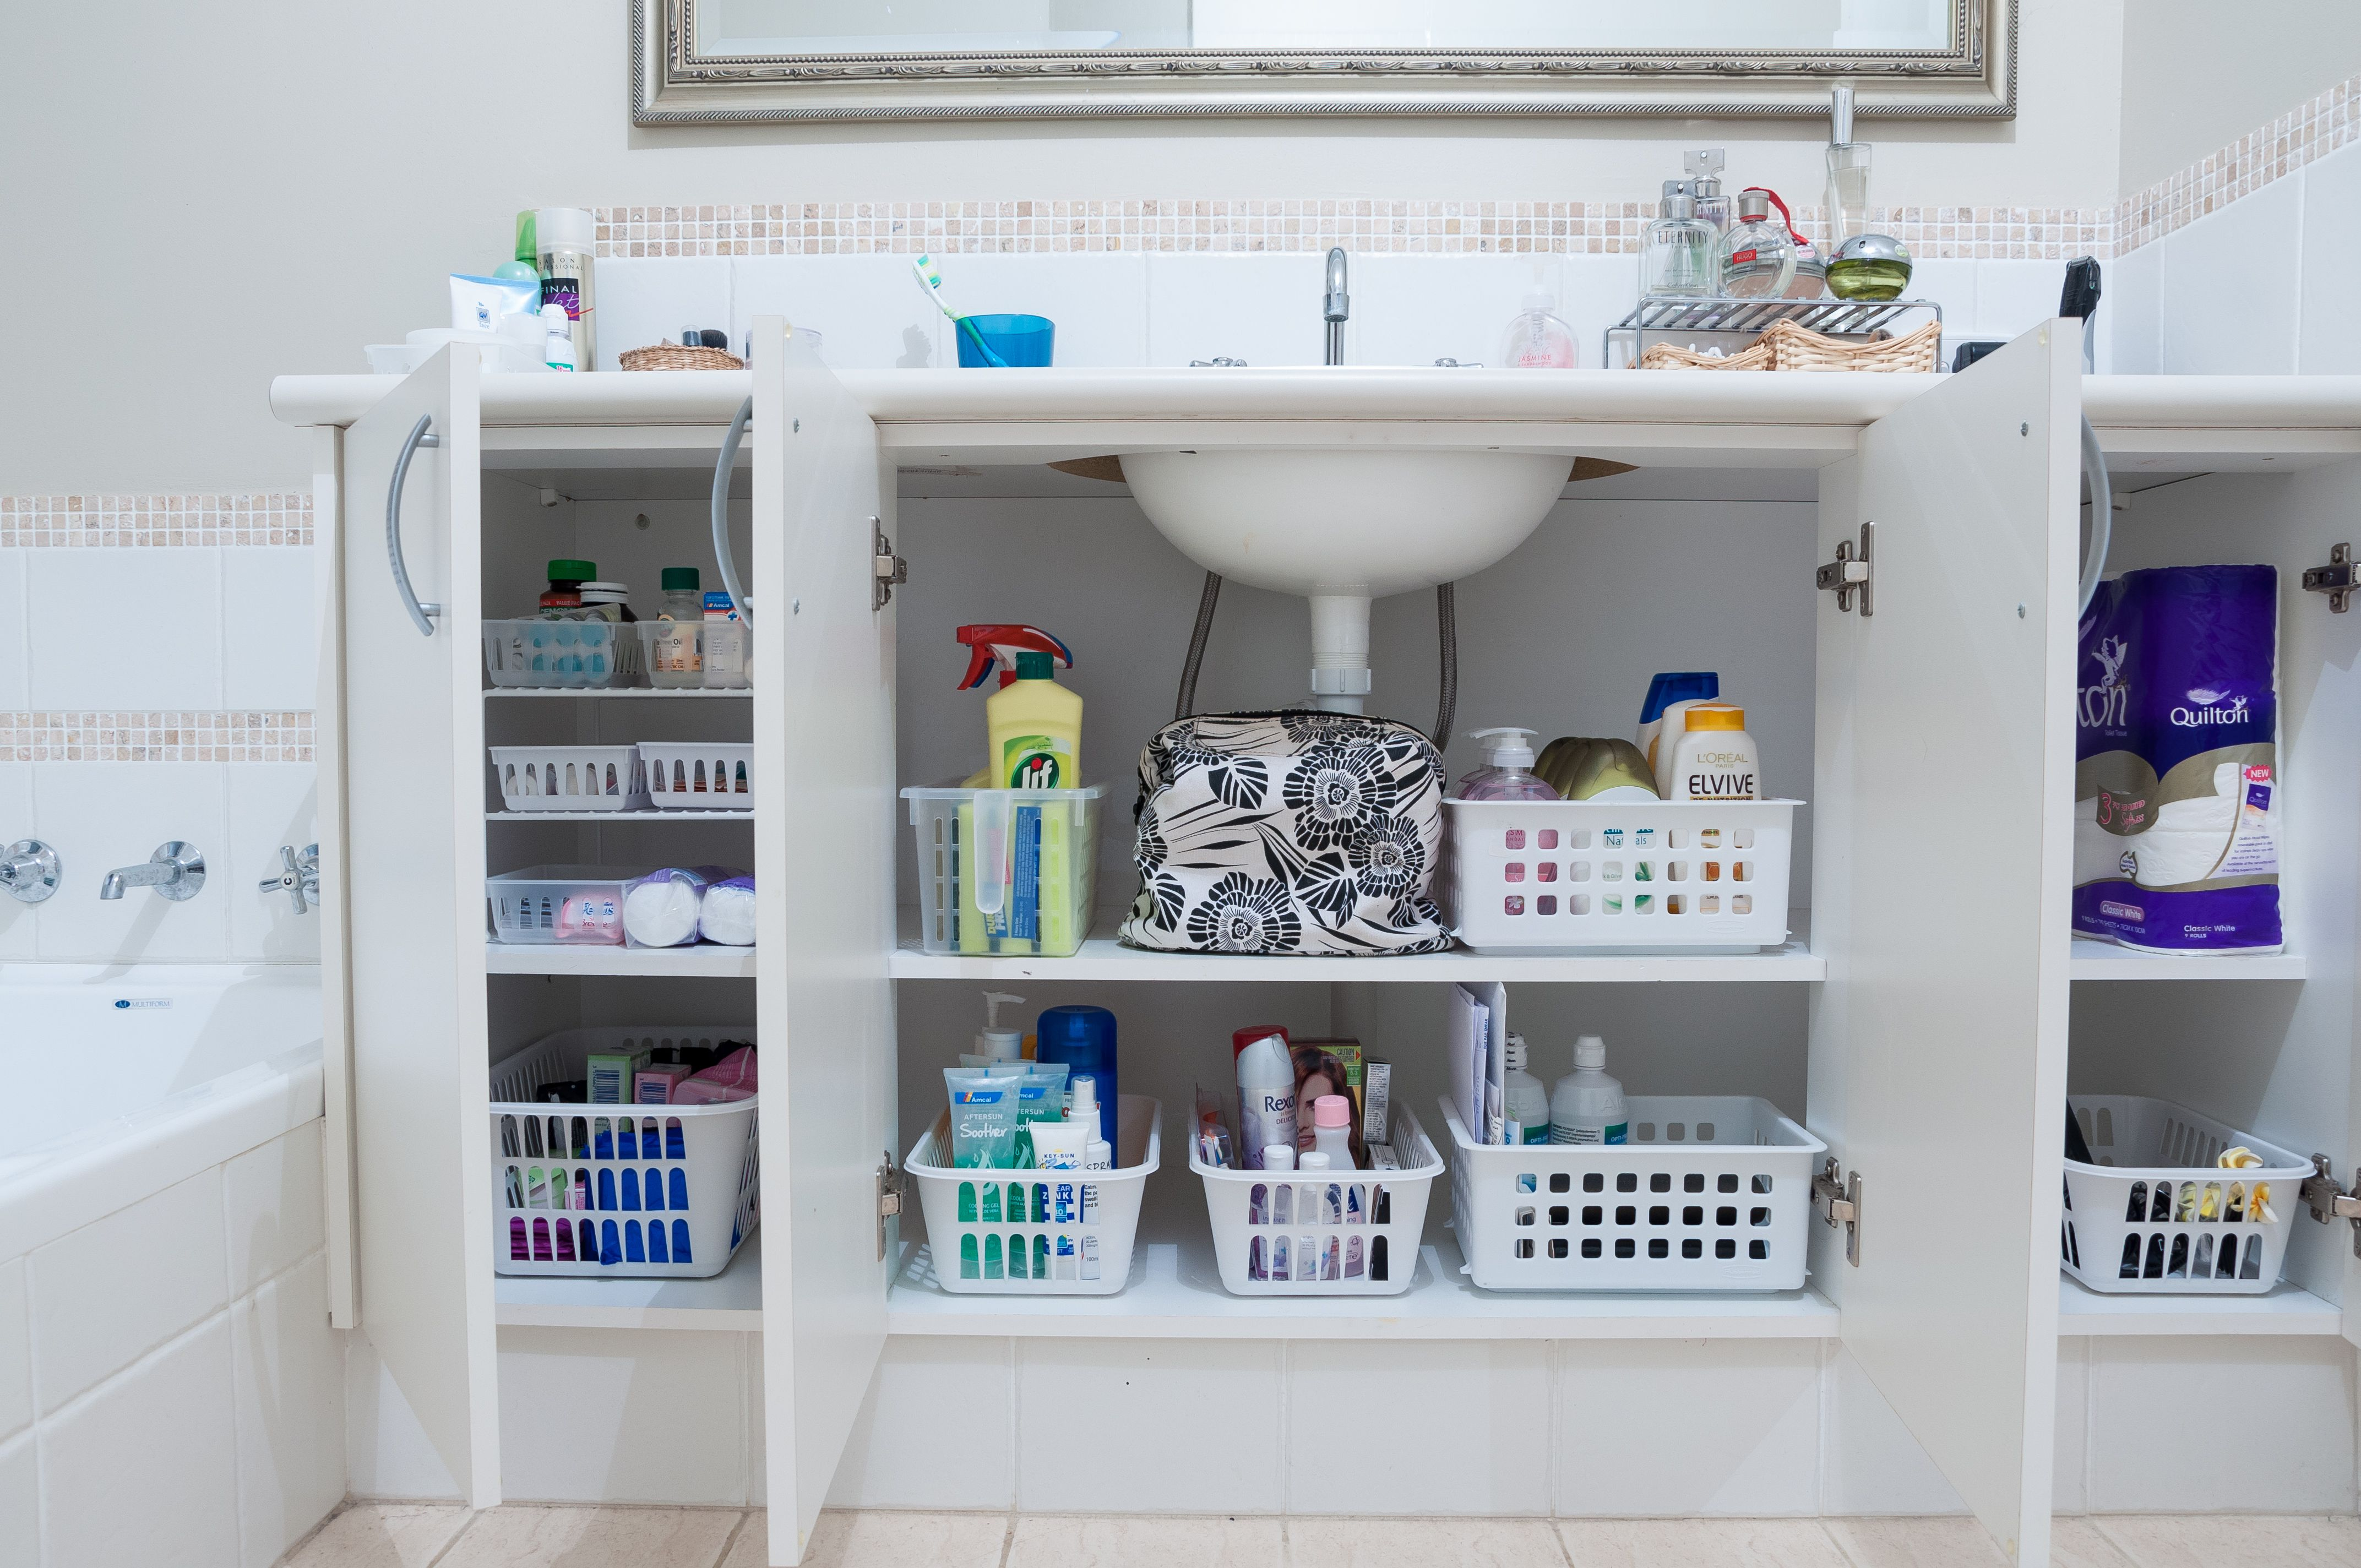 Organised Bathroom Cupboards By Nordic Planning Professional Organiser In Perth Australia W With Images Bathroom Organisation Organisation Hacks Cupboards Organization